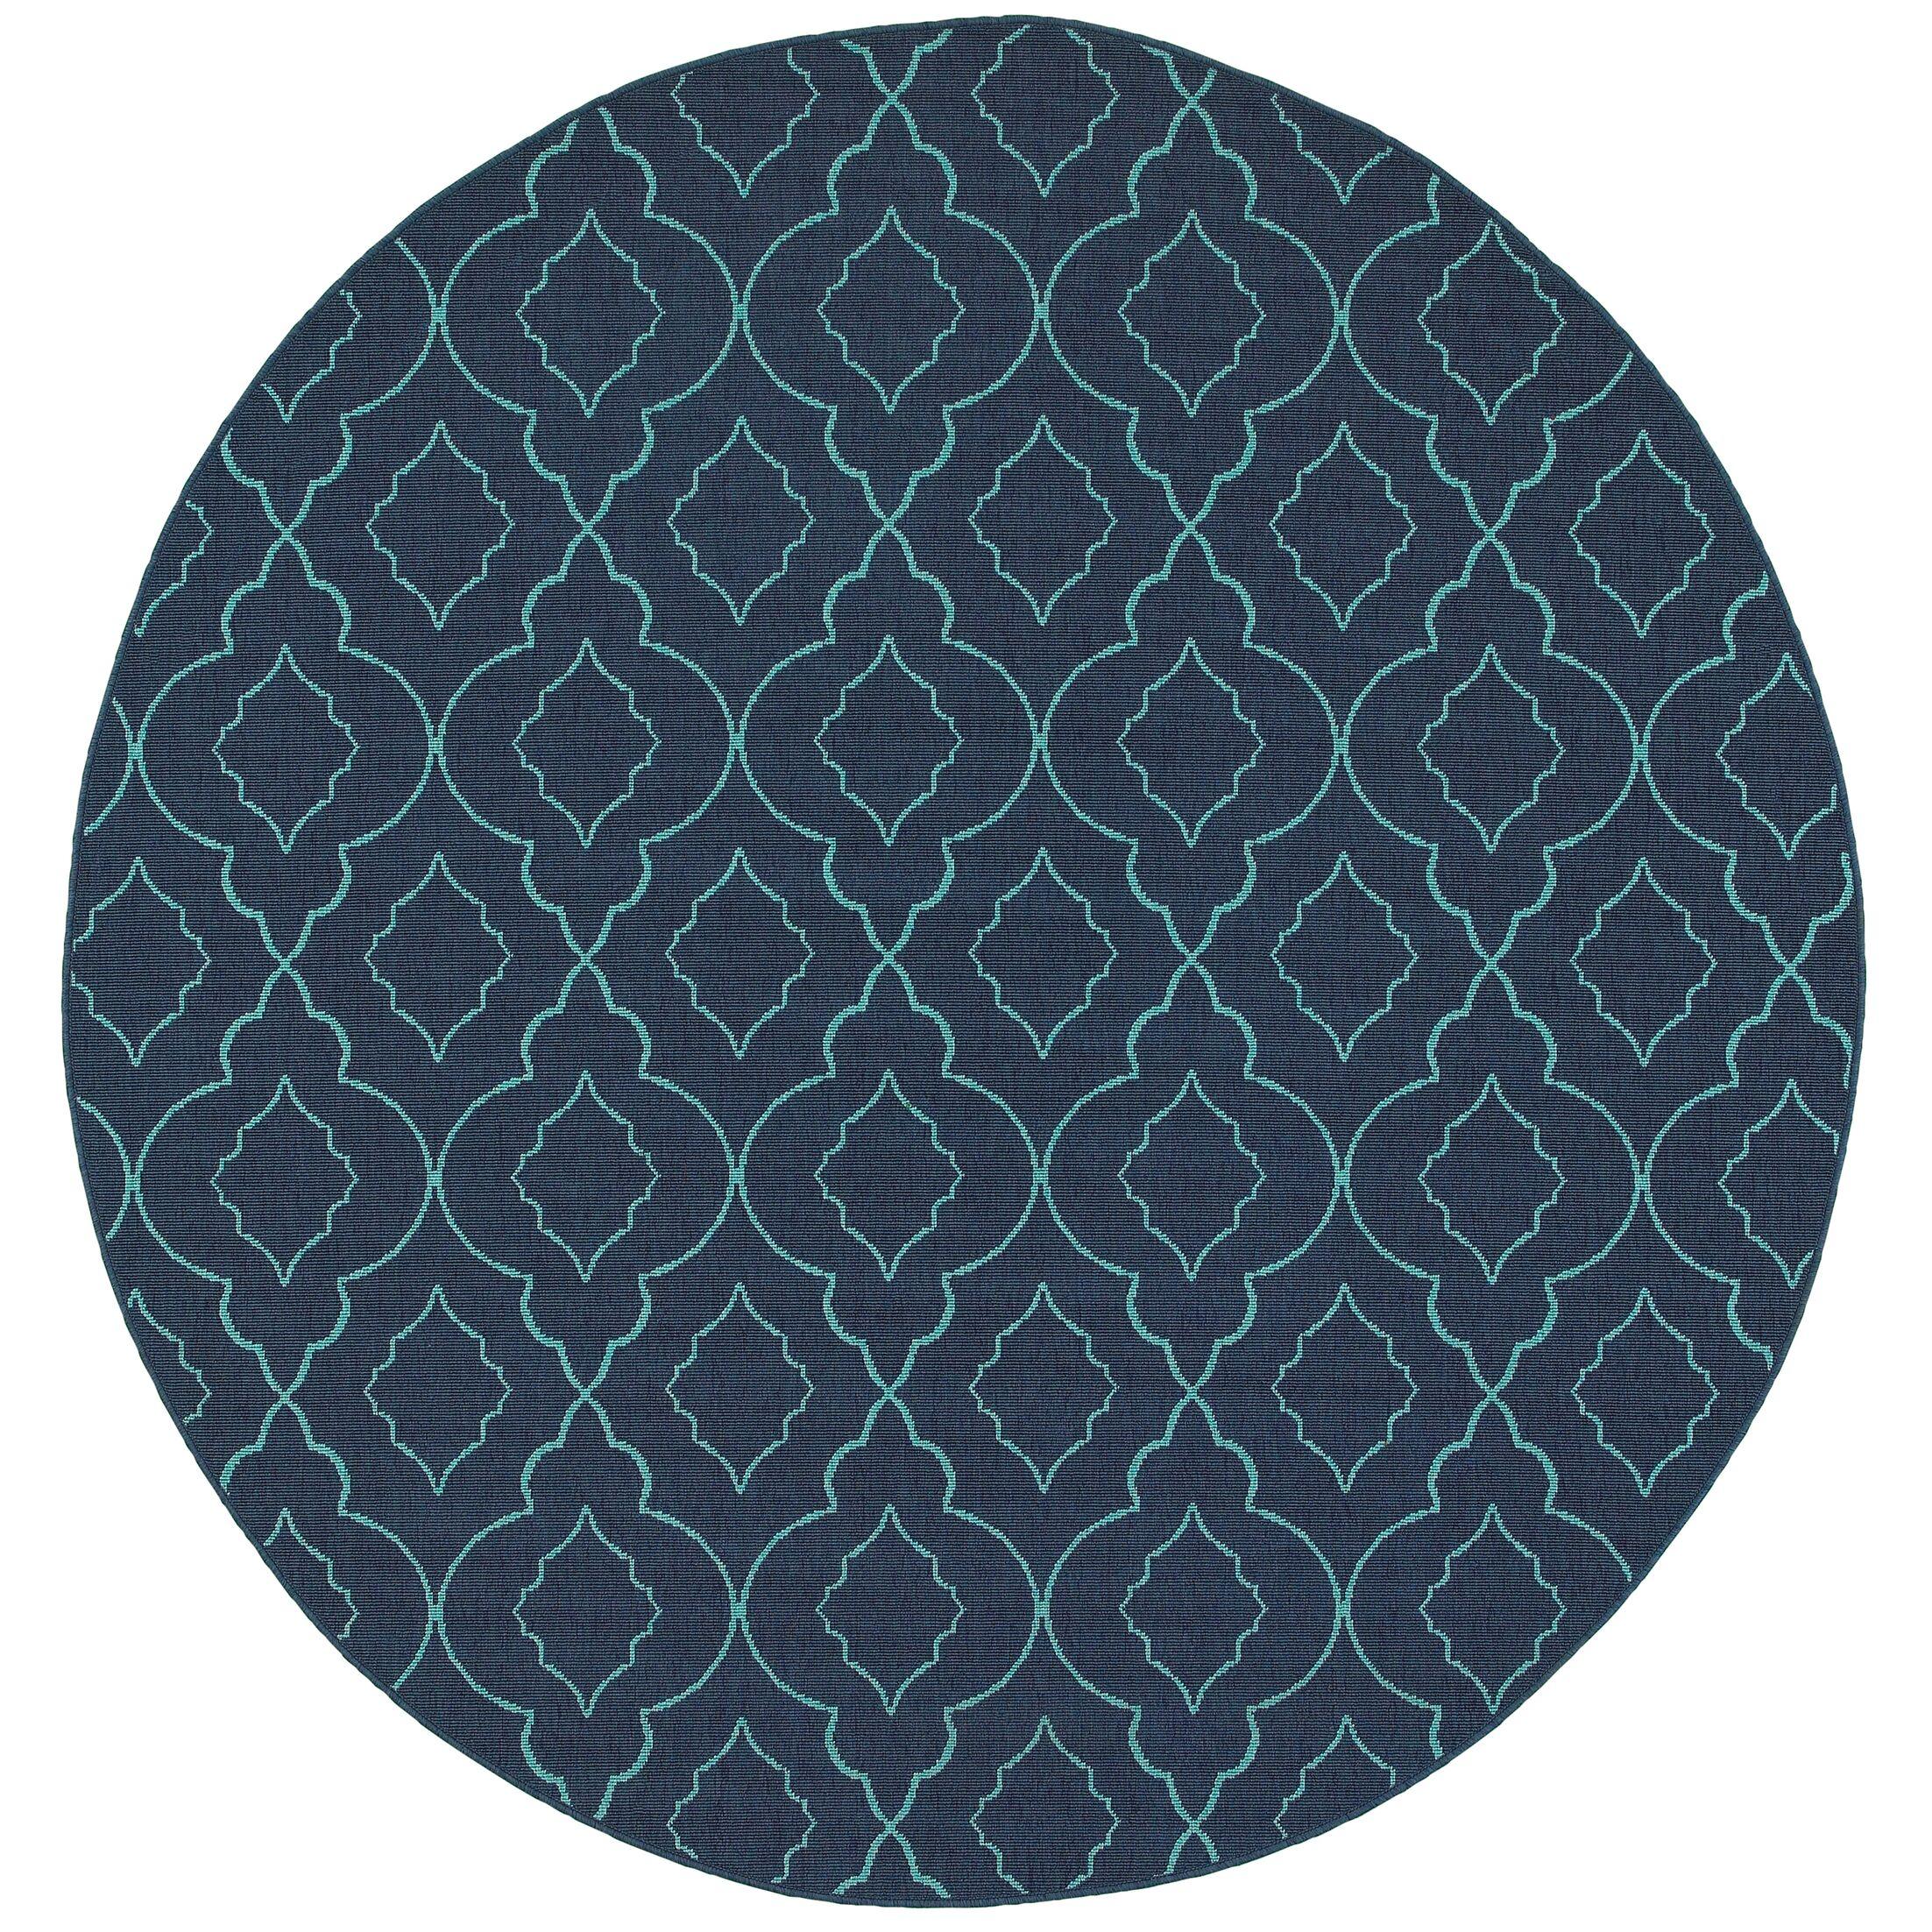 Kailani Navy/Blue Indoor/Outdoor Area Rug Rug Size: Round 7'10